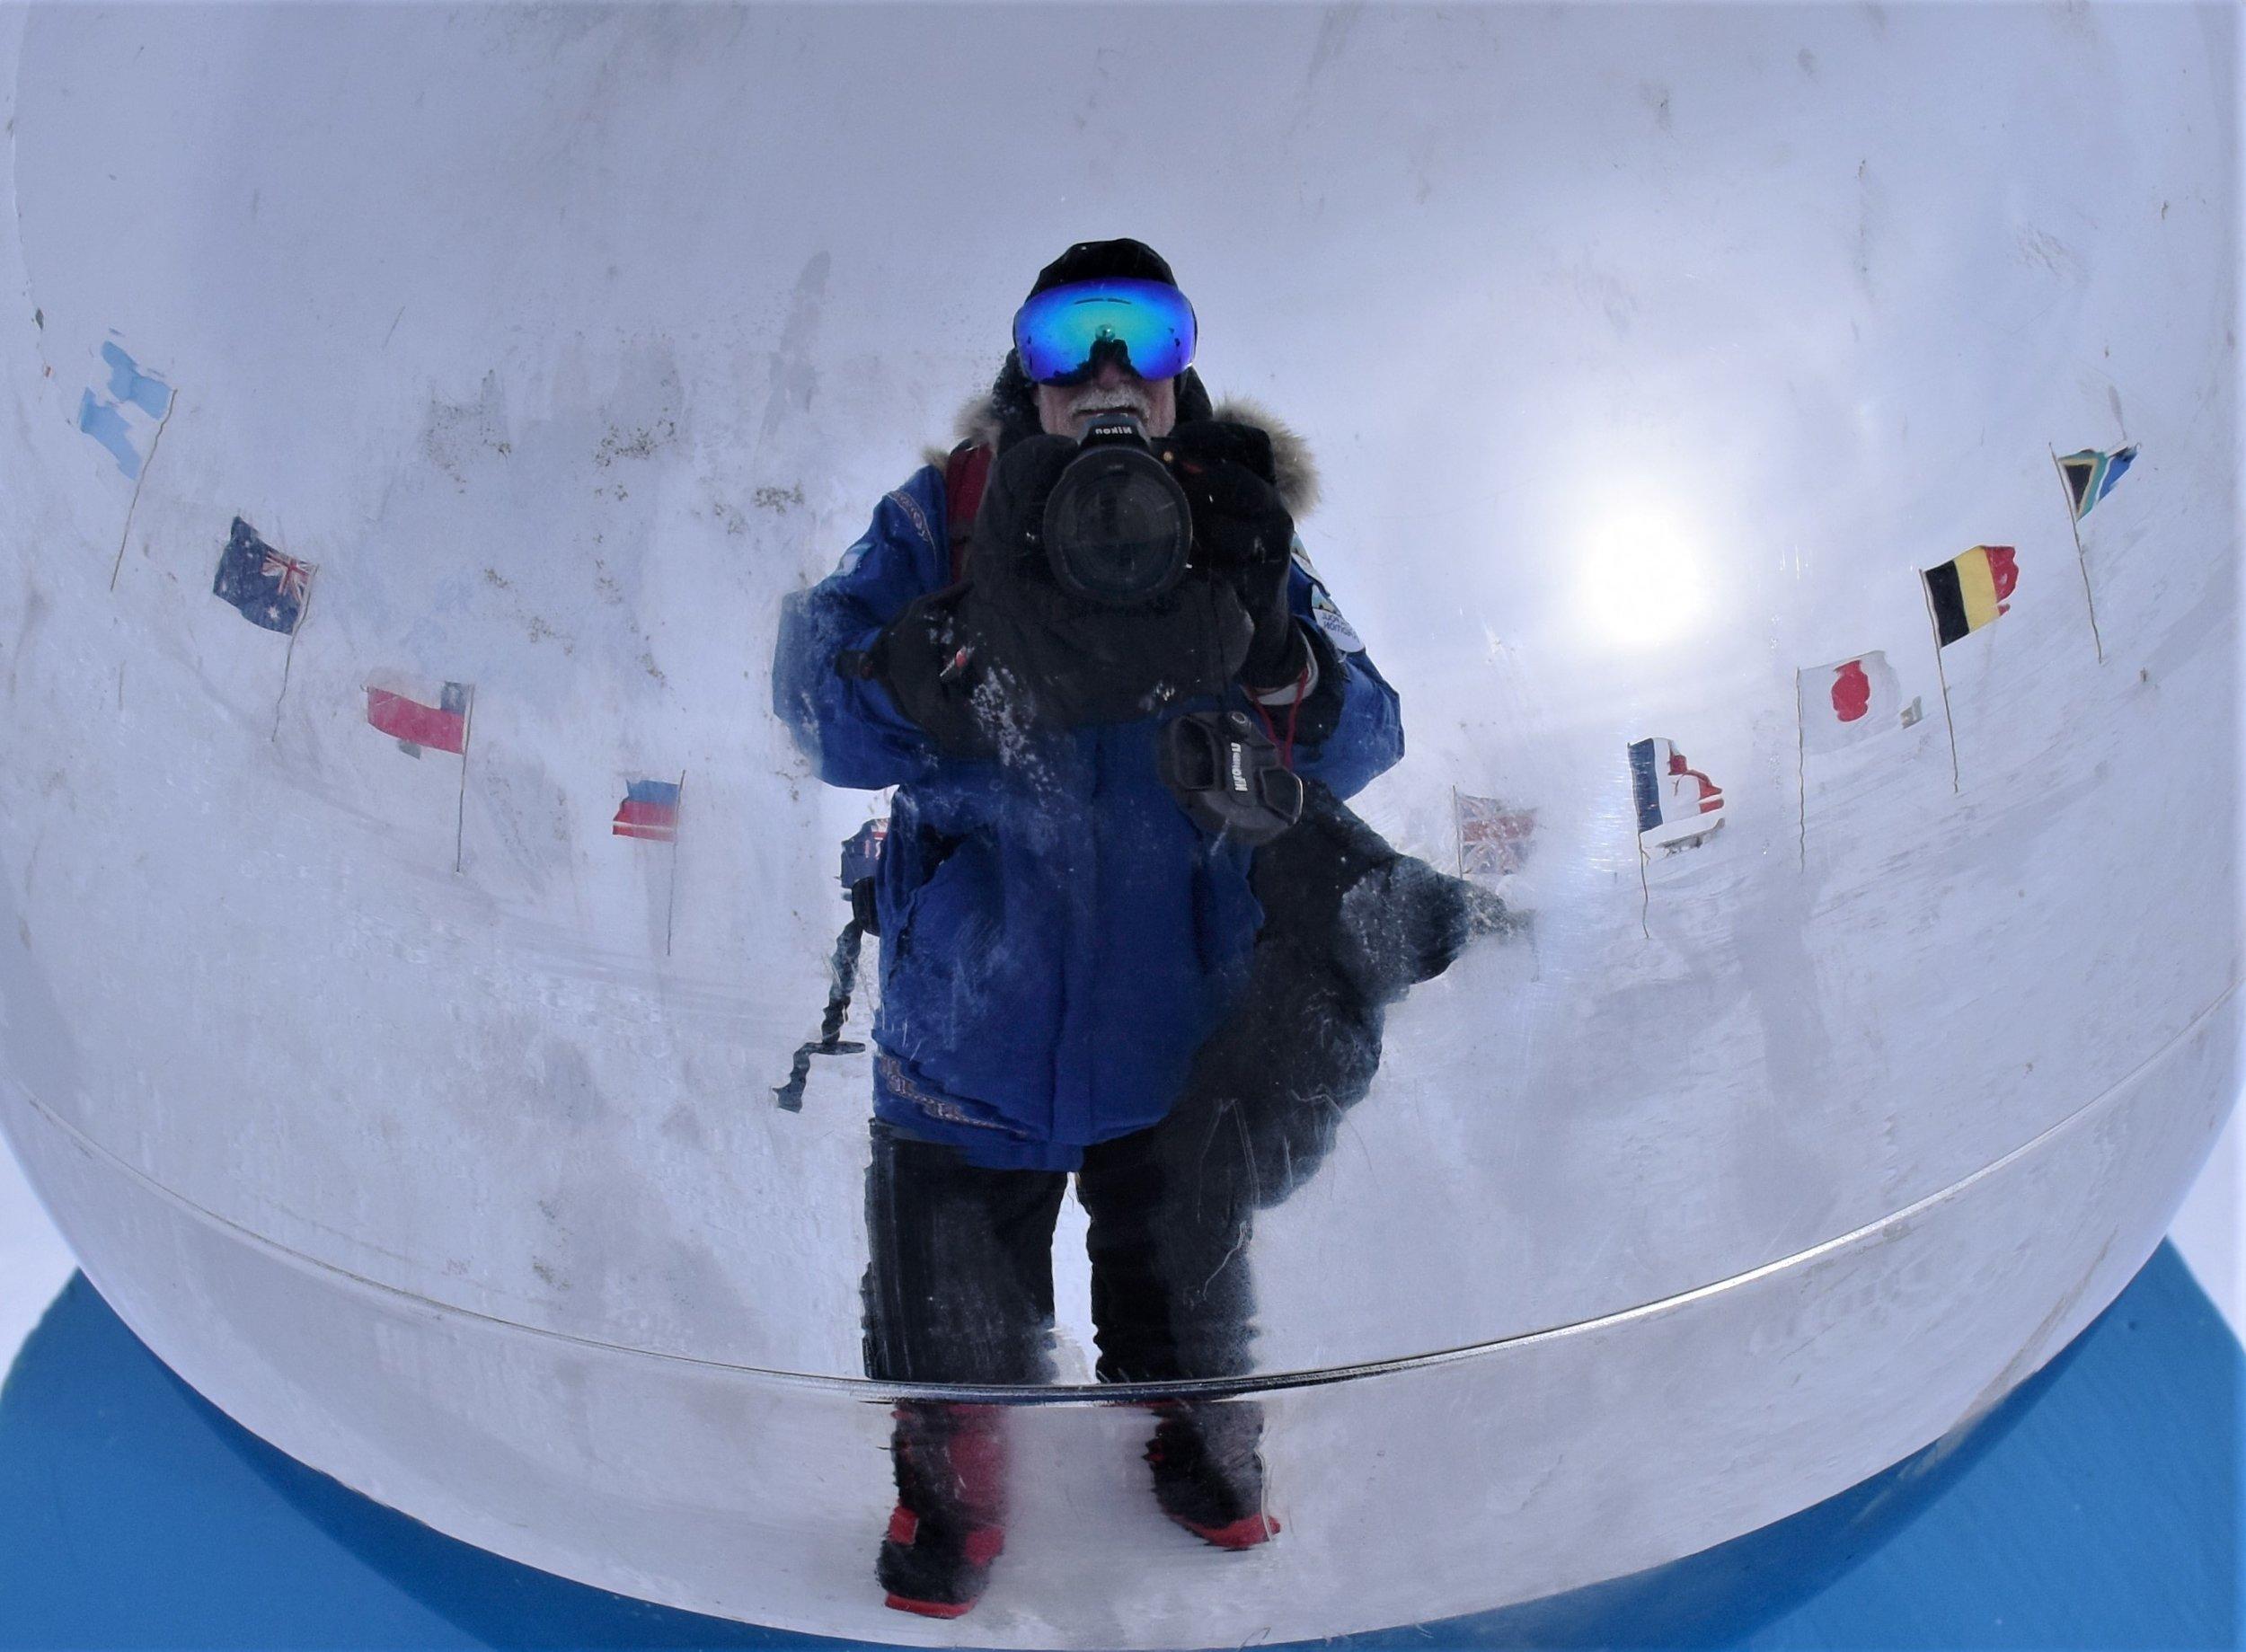 2018-01-12 South Pole (Gibbons N D5600) 182.jpg